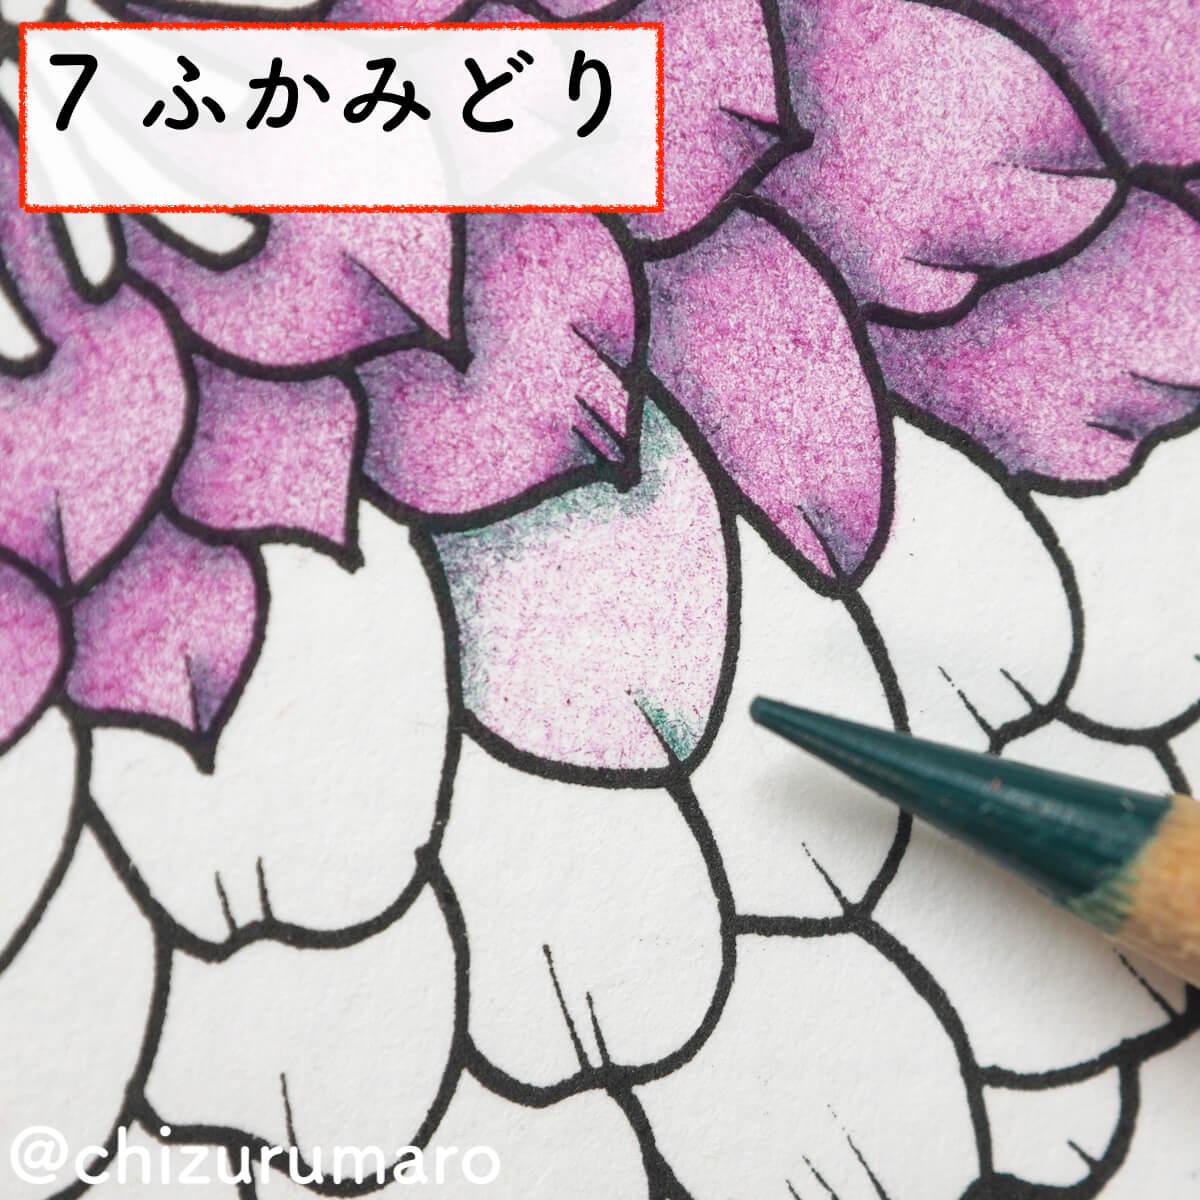 f:id:chizurumaro:20200311151727j:plain